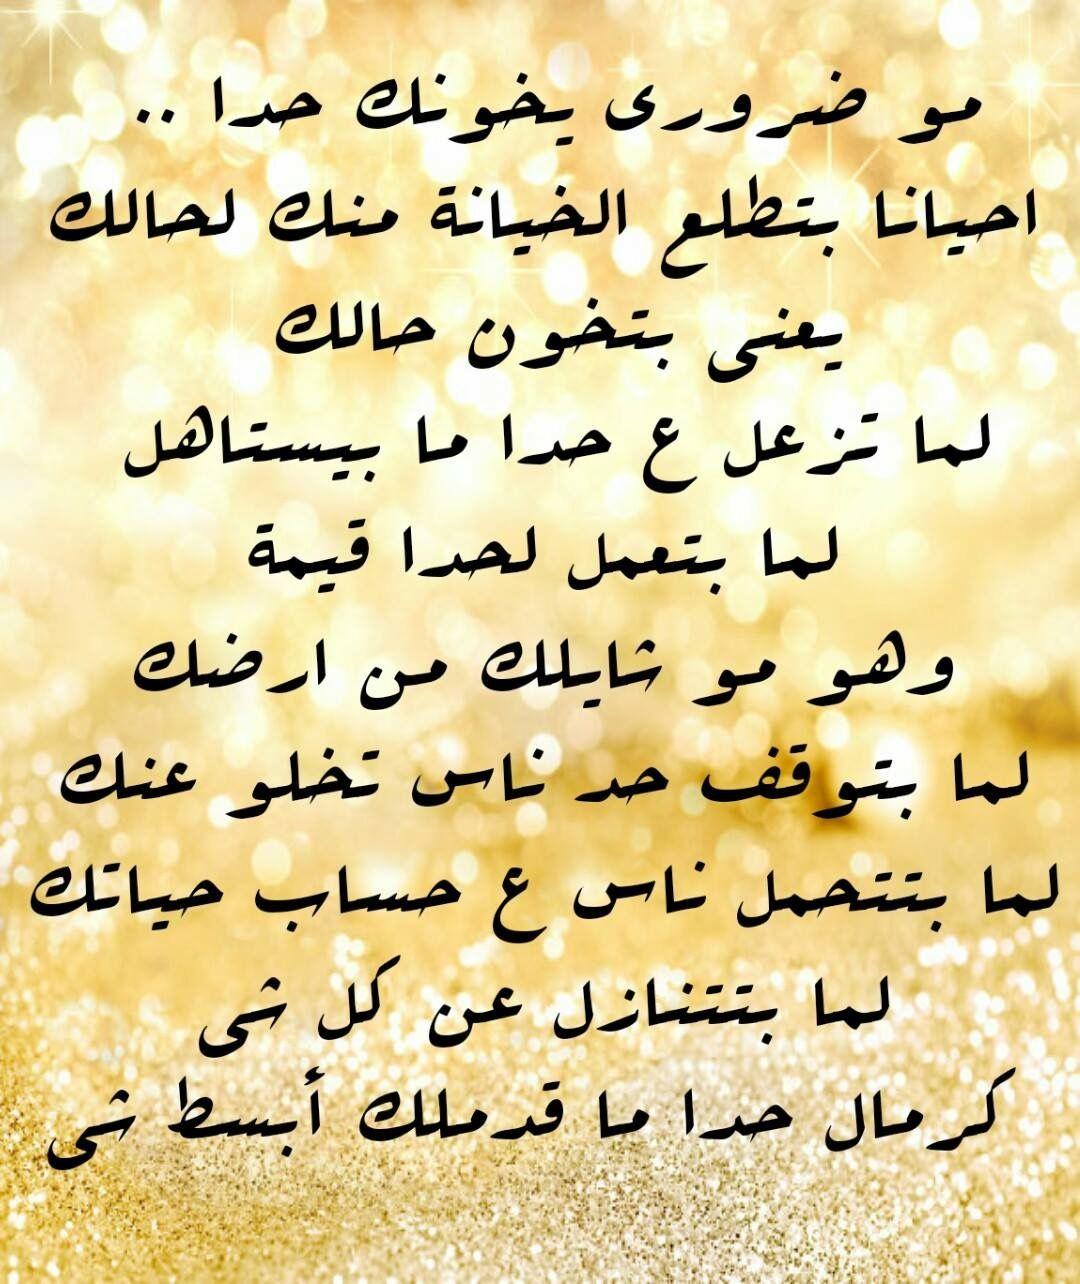 Pin By Dina On فضفضة قلب Arabic Calligraphy Calligraphy